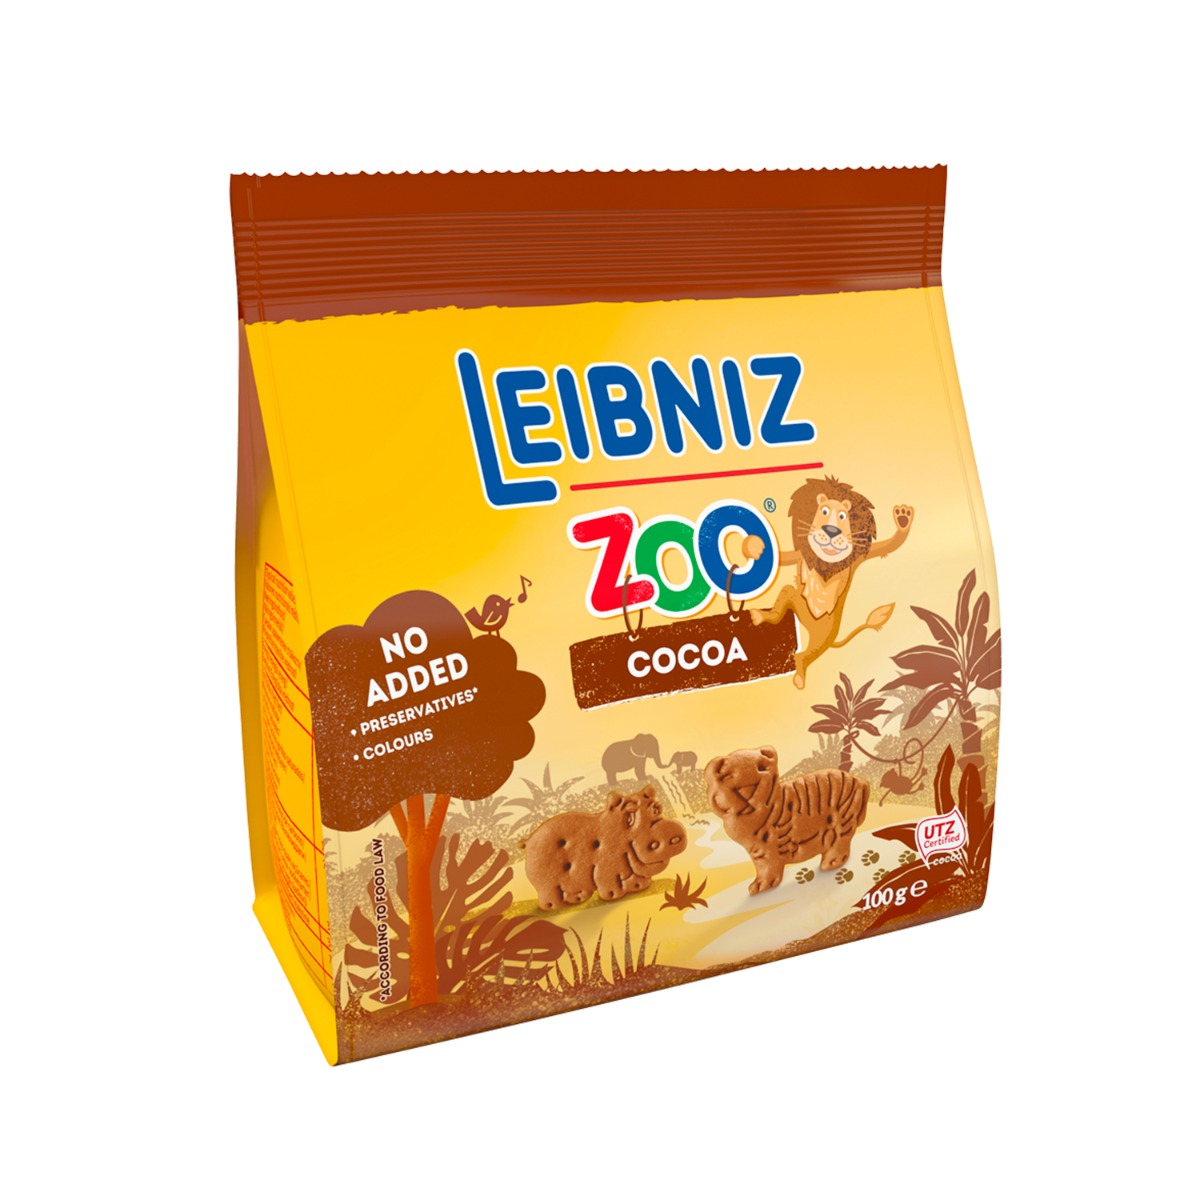 Biscuiti cu ciocolata Leibniz Original Zoo, 100 g imagine 2021